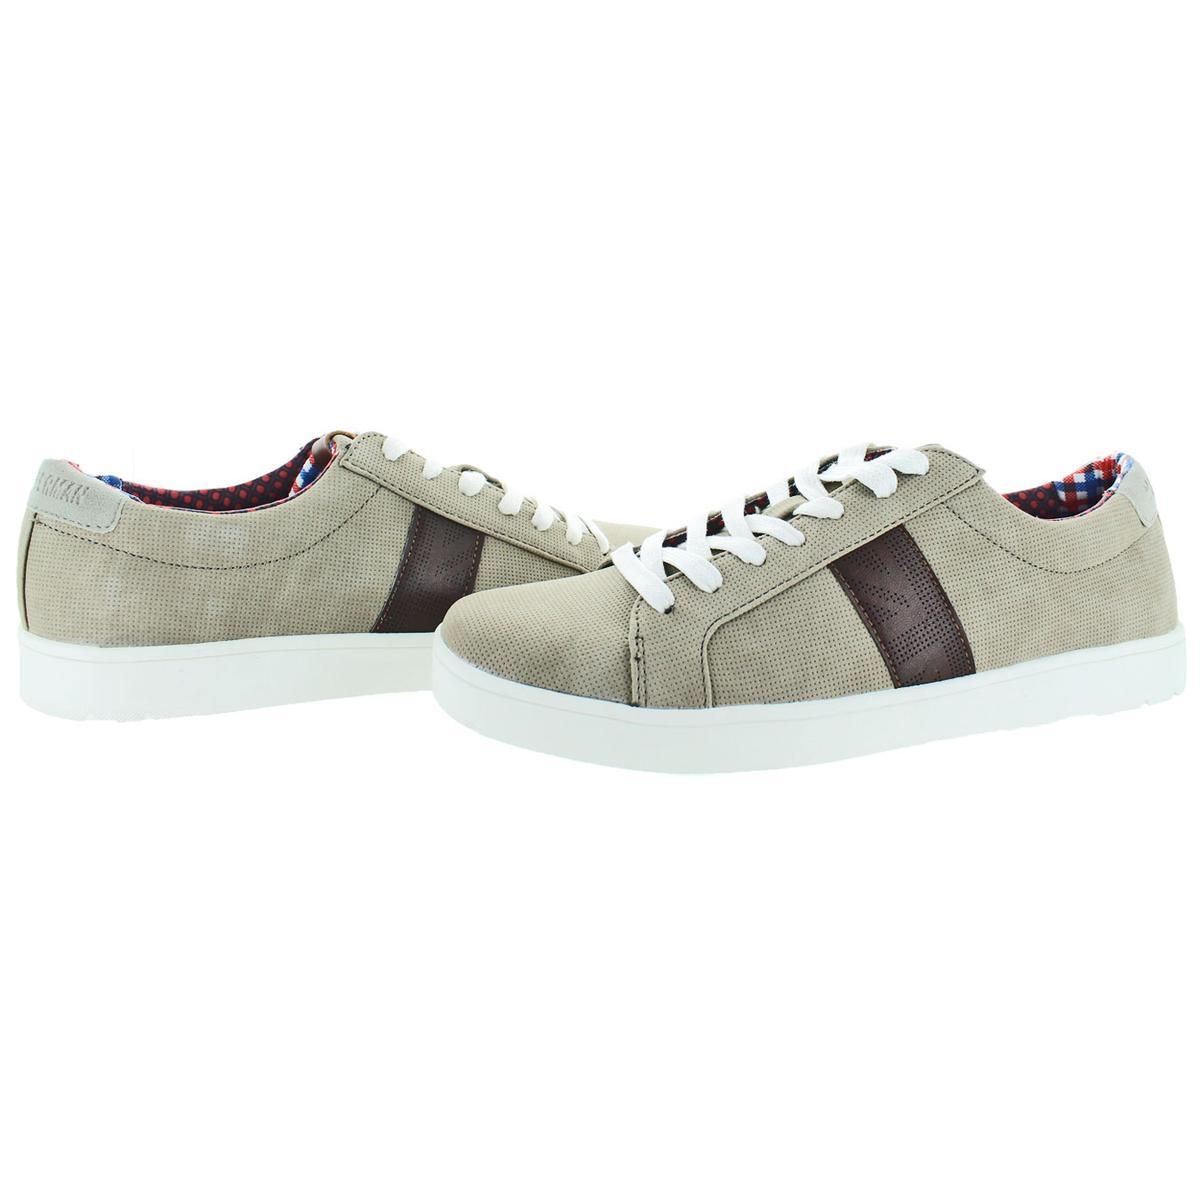 Ben-Sherman-Ashton-Men-039-s-Fashion-Court-Sneakers-Shoes thumbnail 8